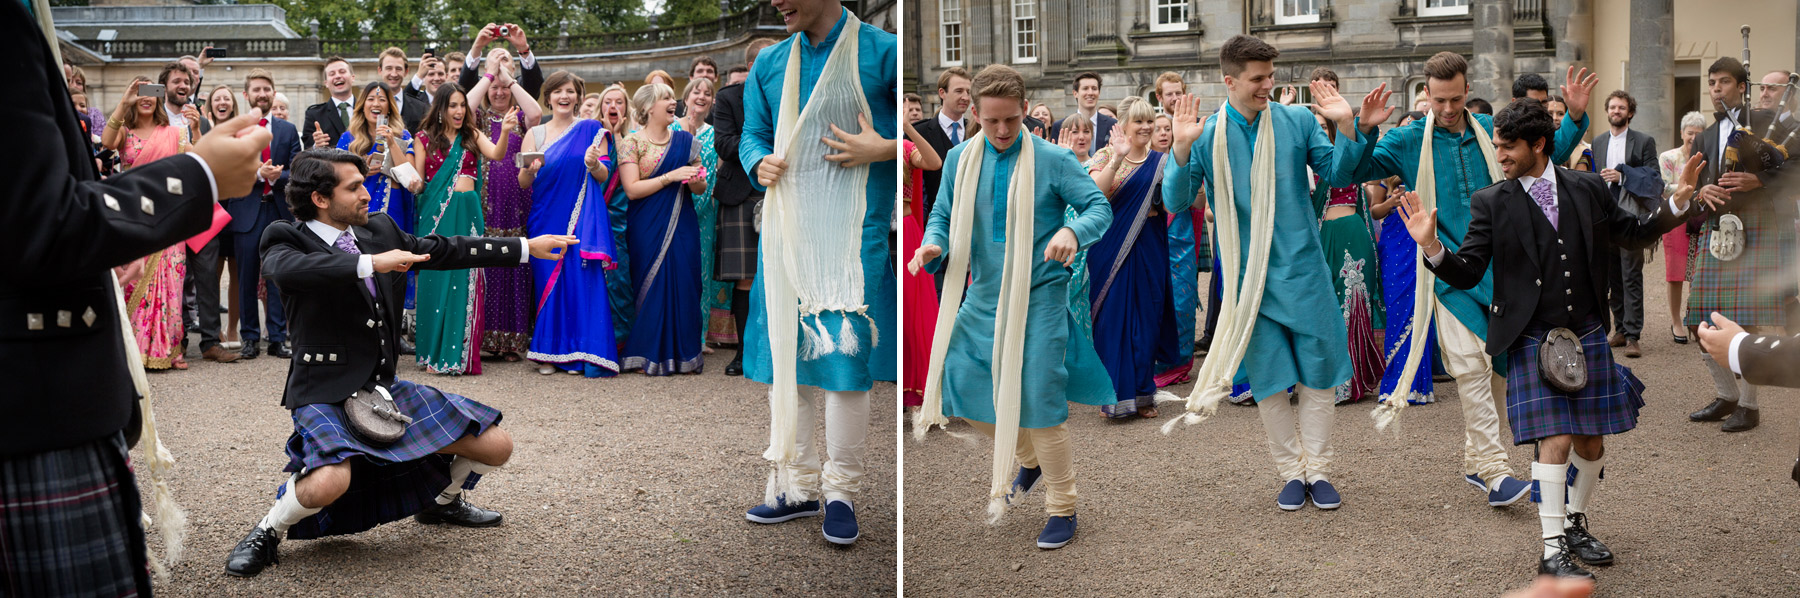 Bollywood dancing and kilts in Scotland